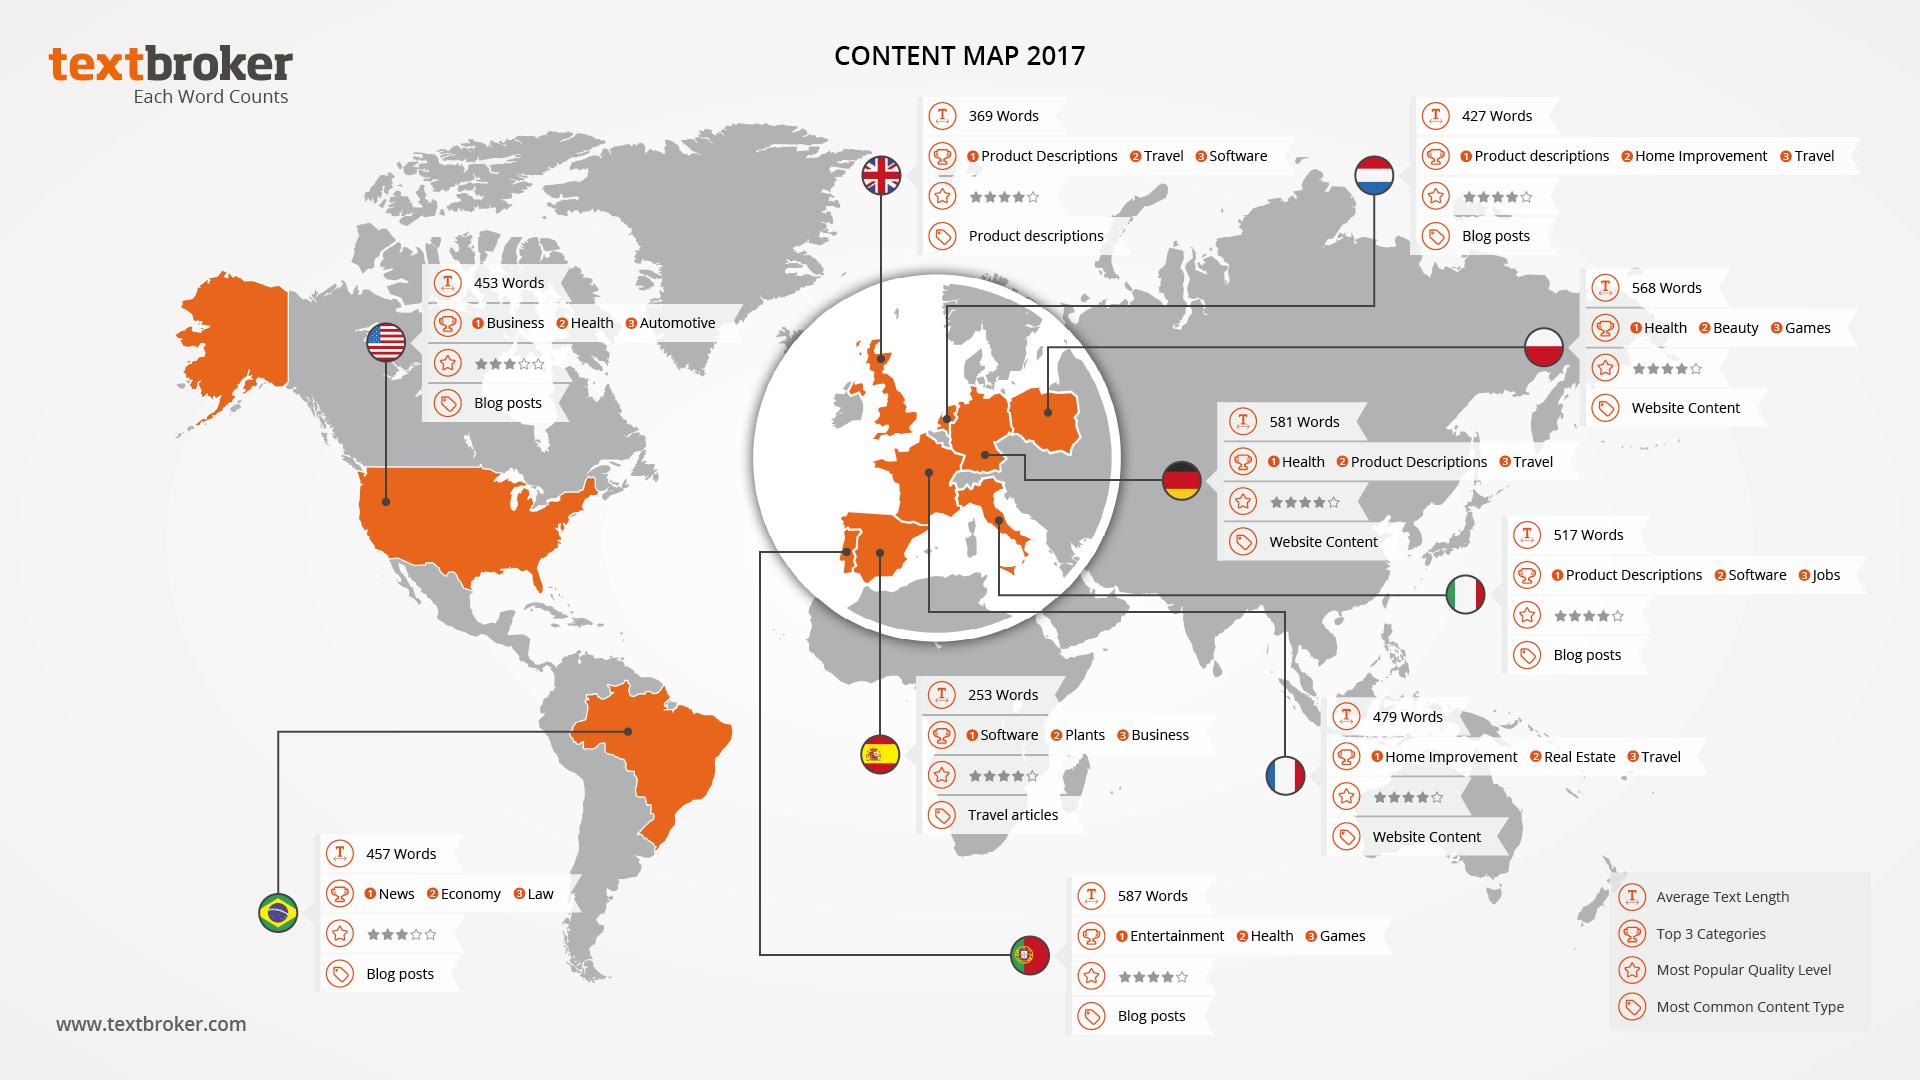 Textbroker Content Map 2017